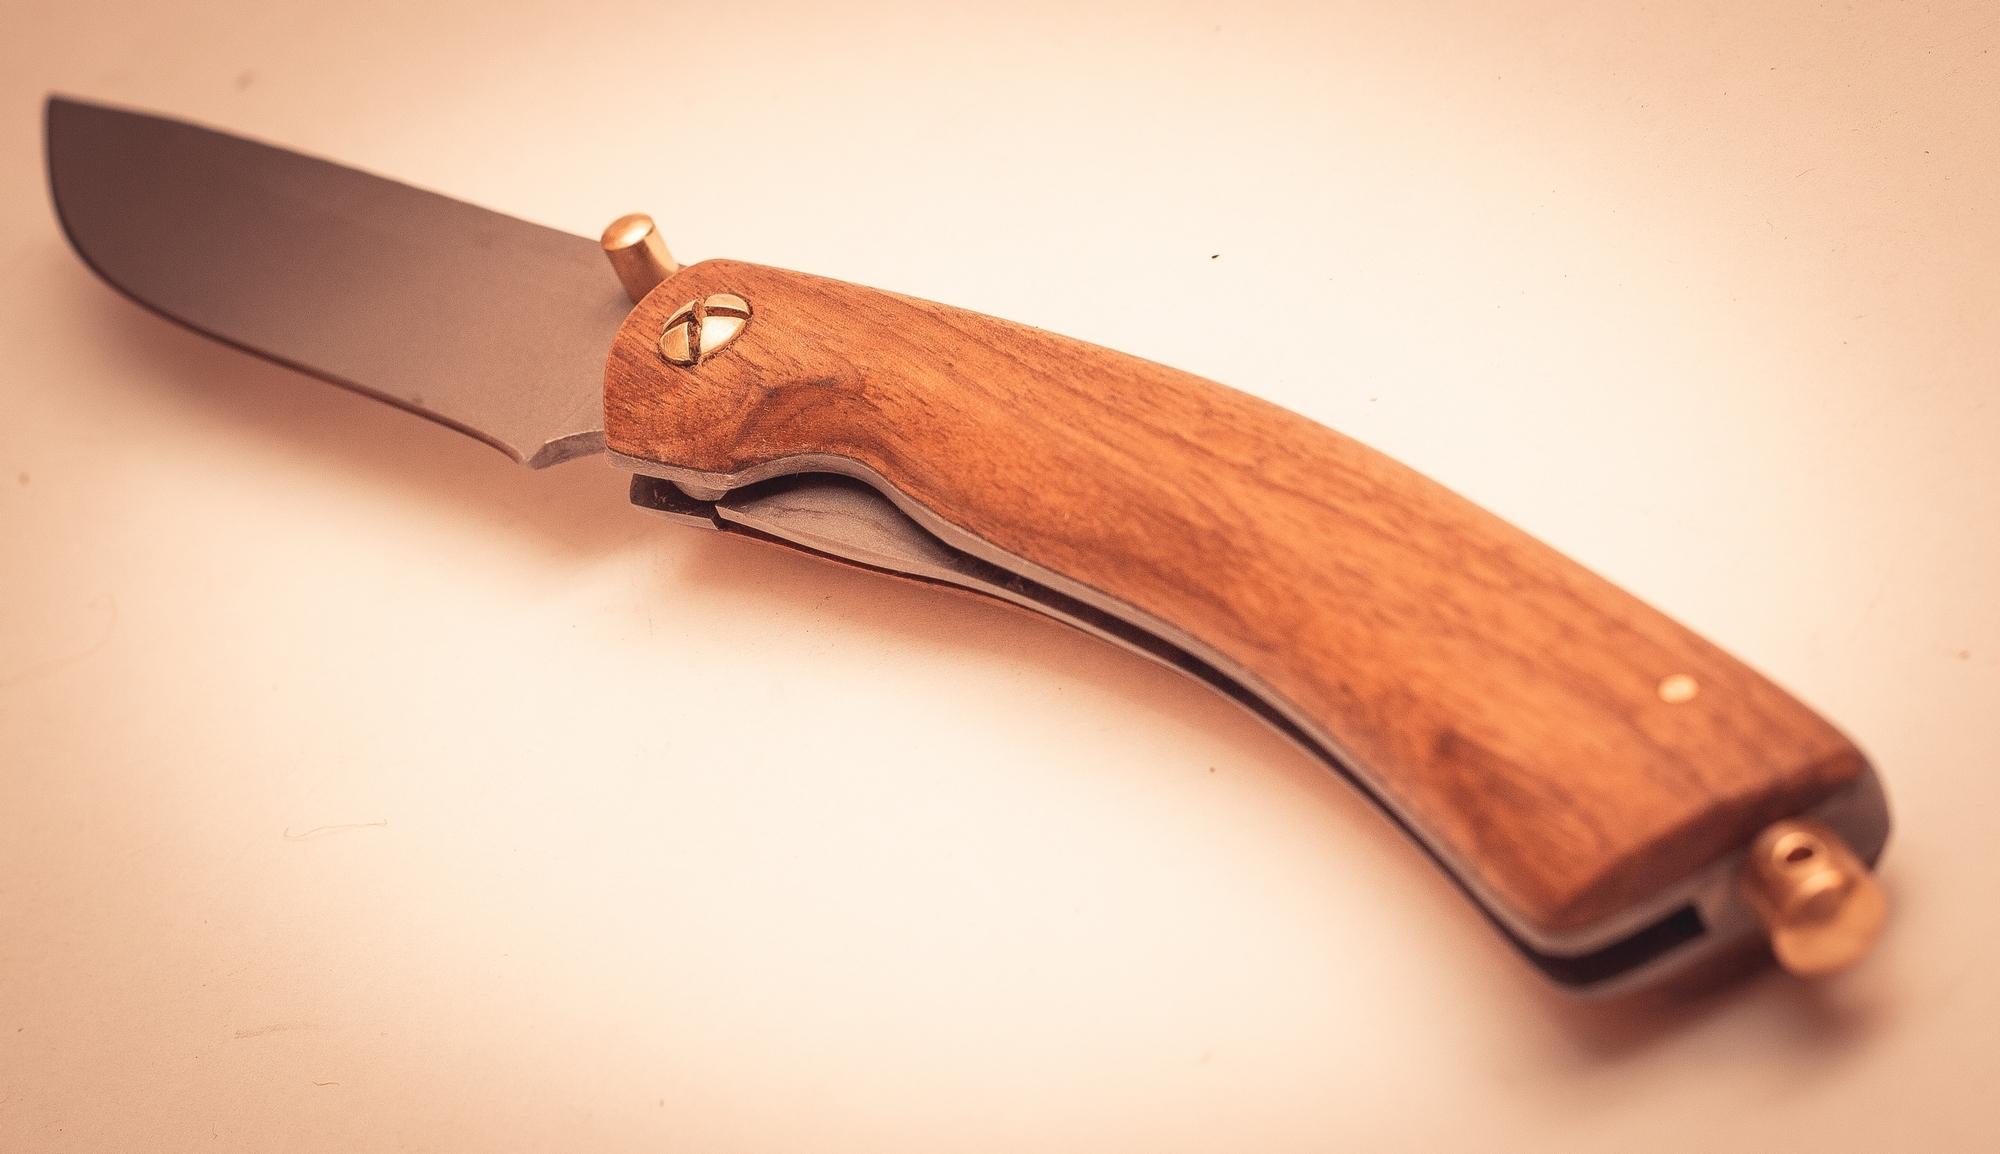 Складной нож Помор, сталь 95х18, орех